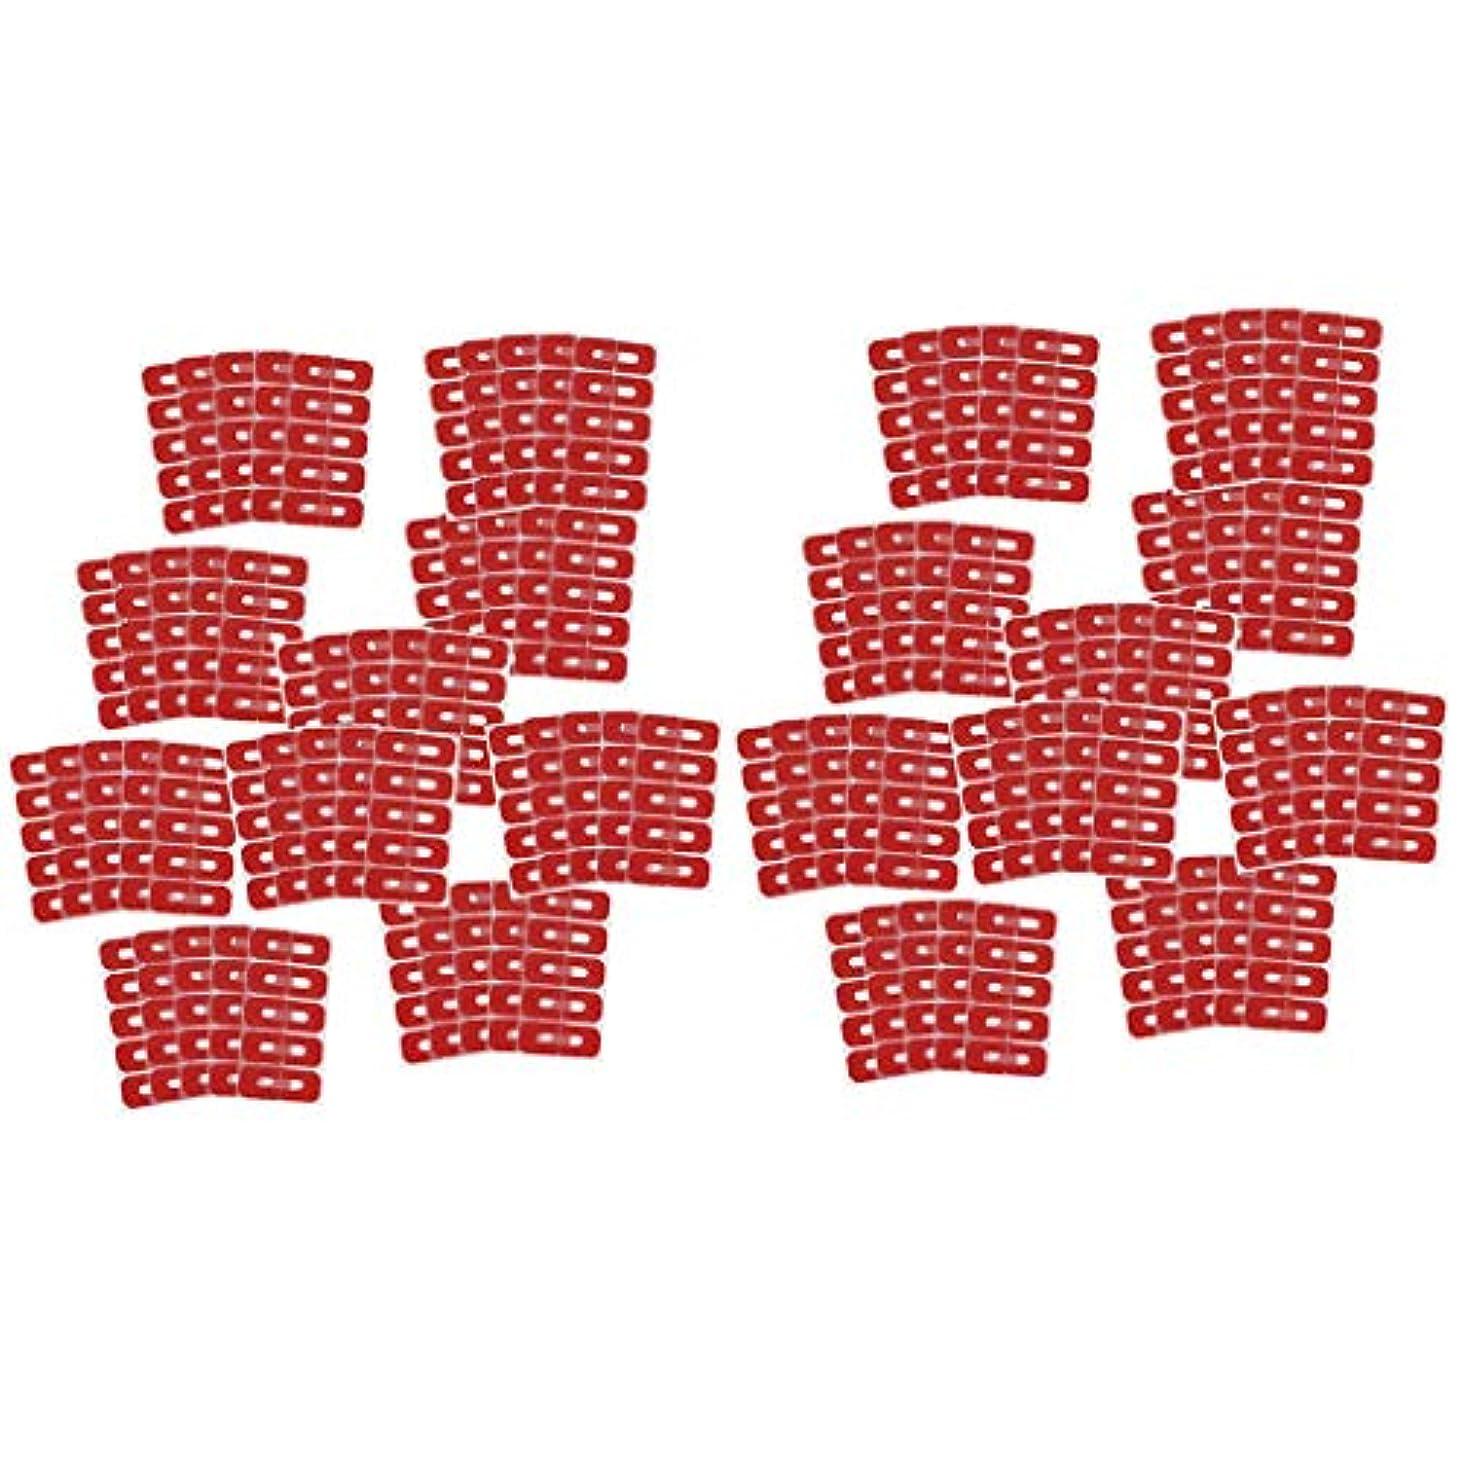 CUTICATE ネイルカバー ネイルプロテクター ネイルアート はみ出し防止 溢れを防止 マニキュア ネイルケア